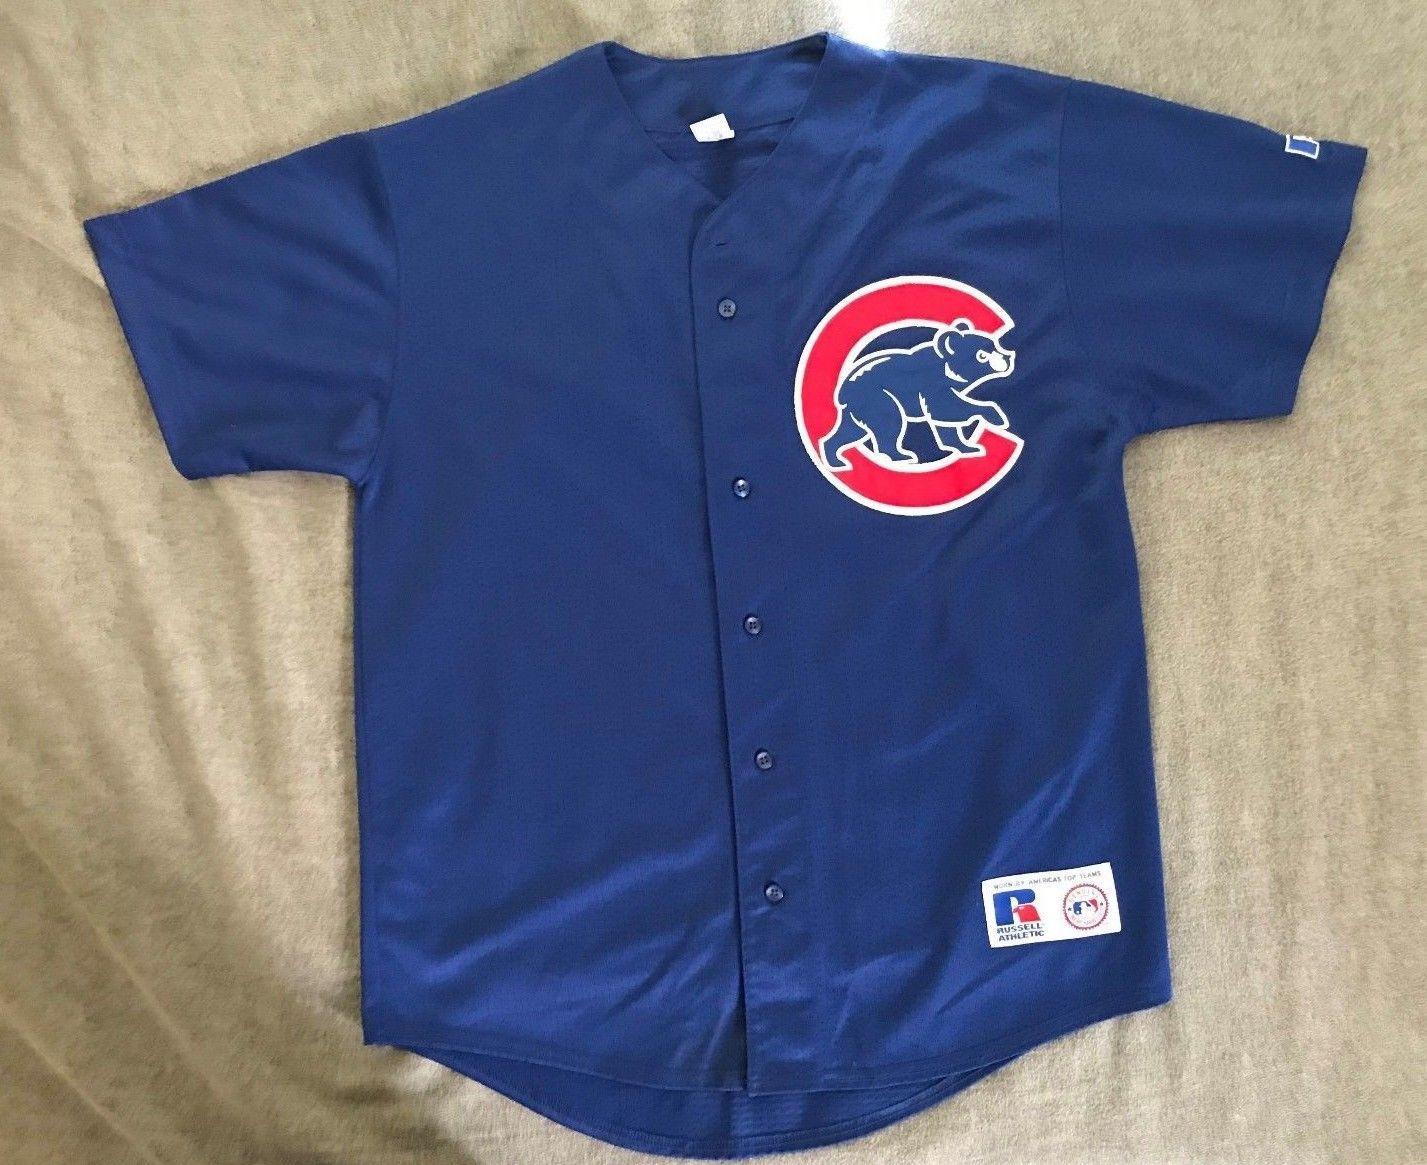 07d1b8839 Men s vintage Russell Athletic MLB Chicago Cubs jersey Aramis Ramirez  21  size M